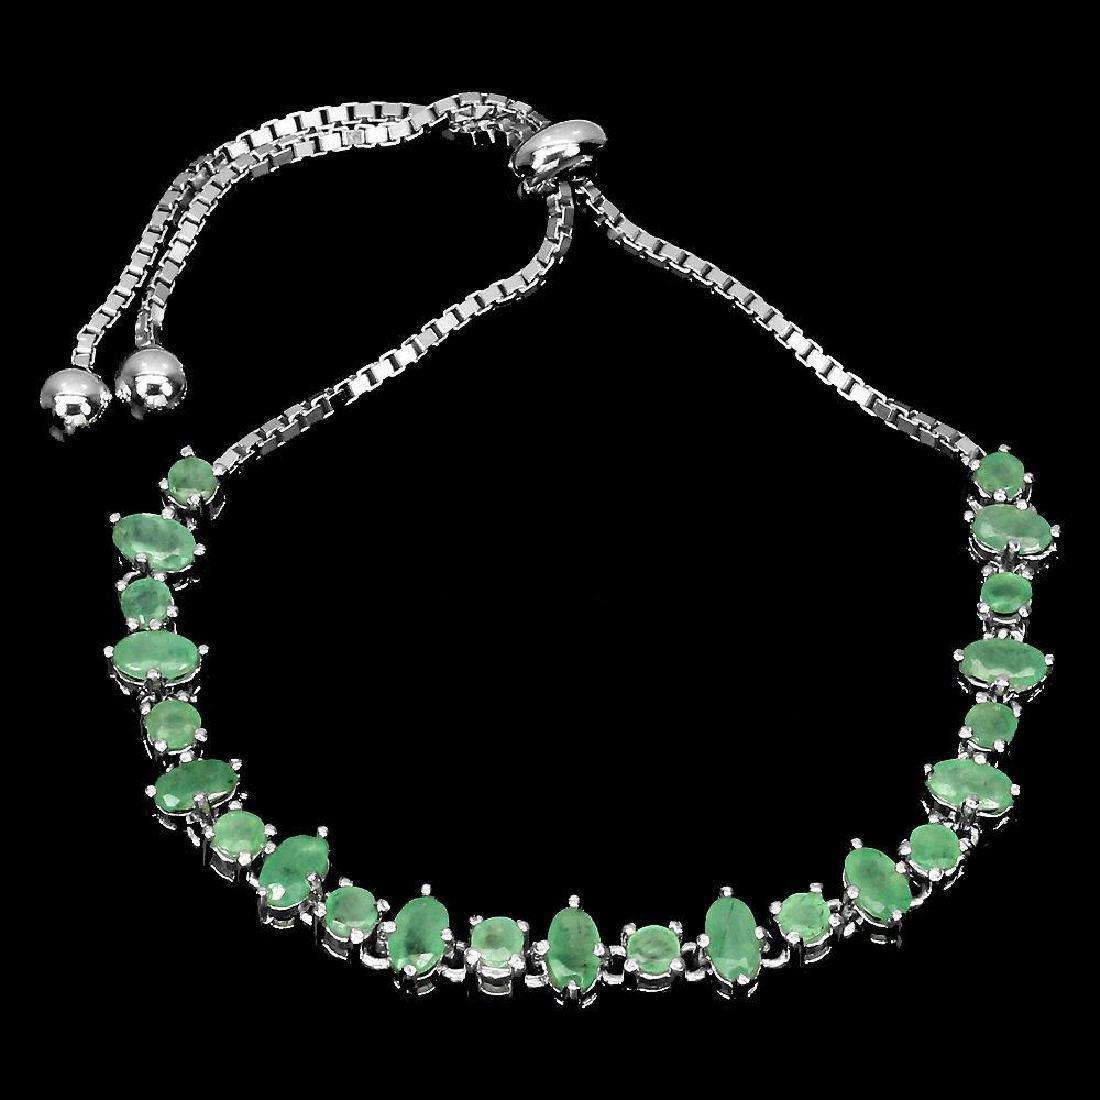 Sterling Silver Emerald Bracelet, 3.27ctw - 3